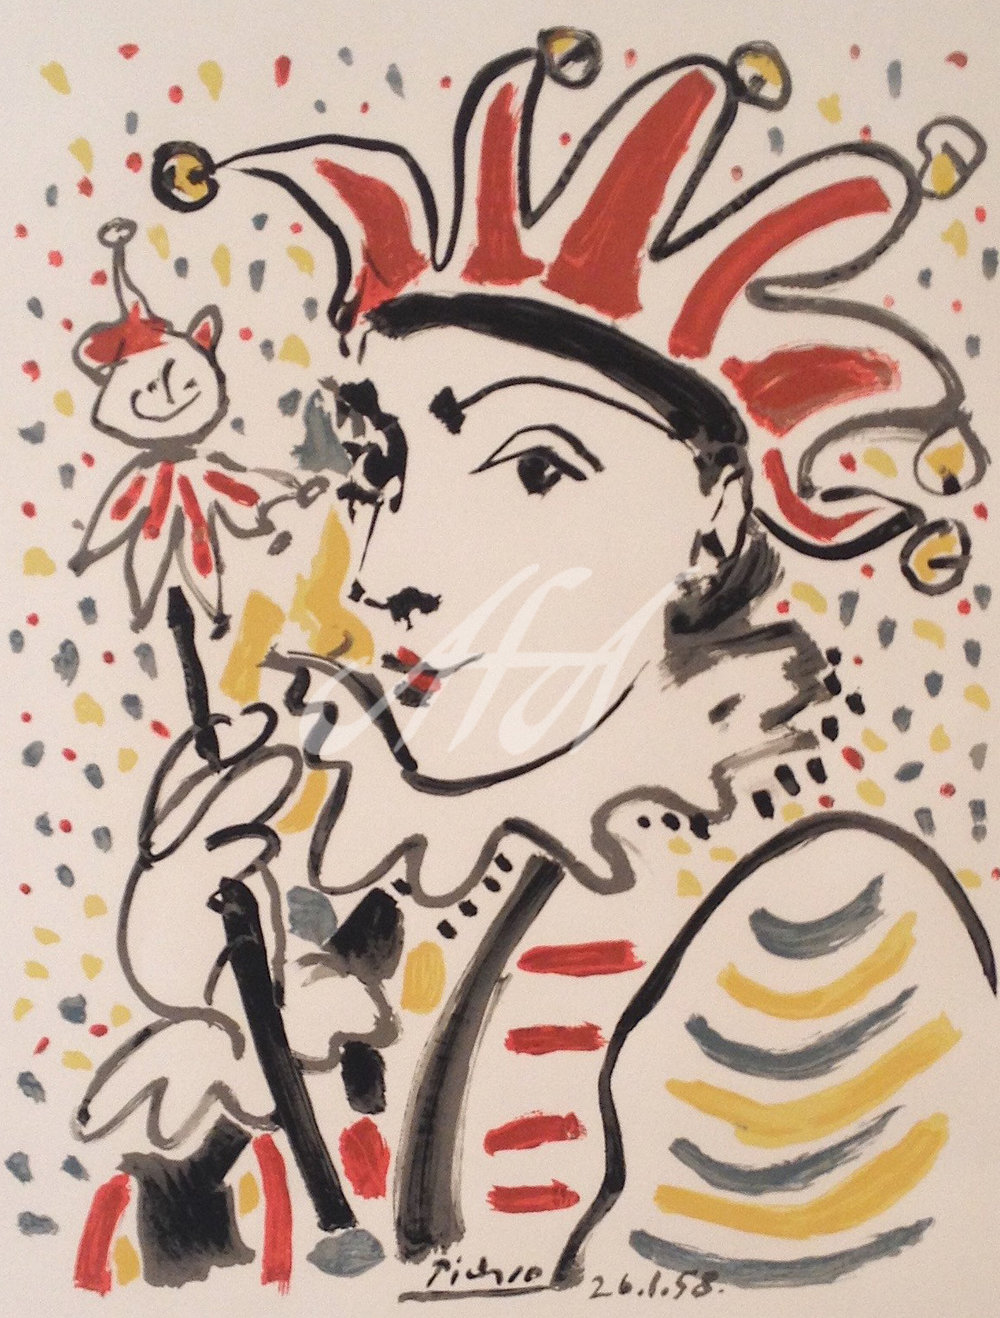 Picasso_La Folie (le Carnaval) watermark.jpg